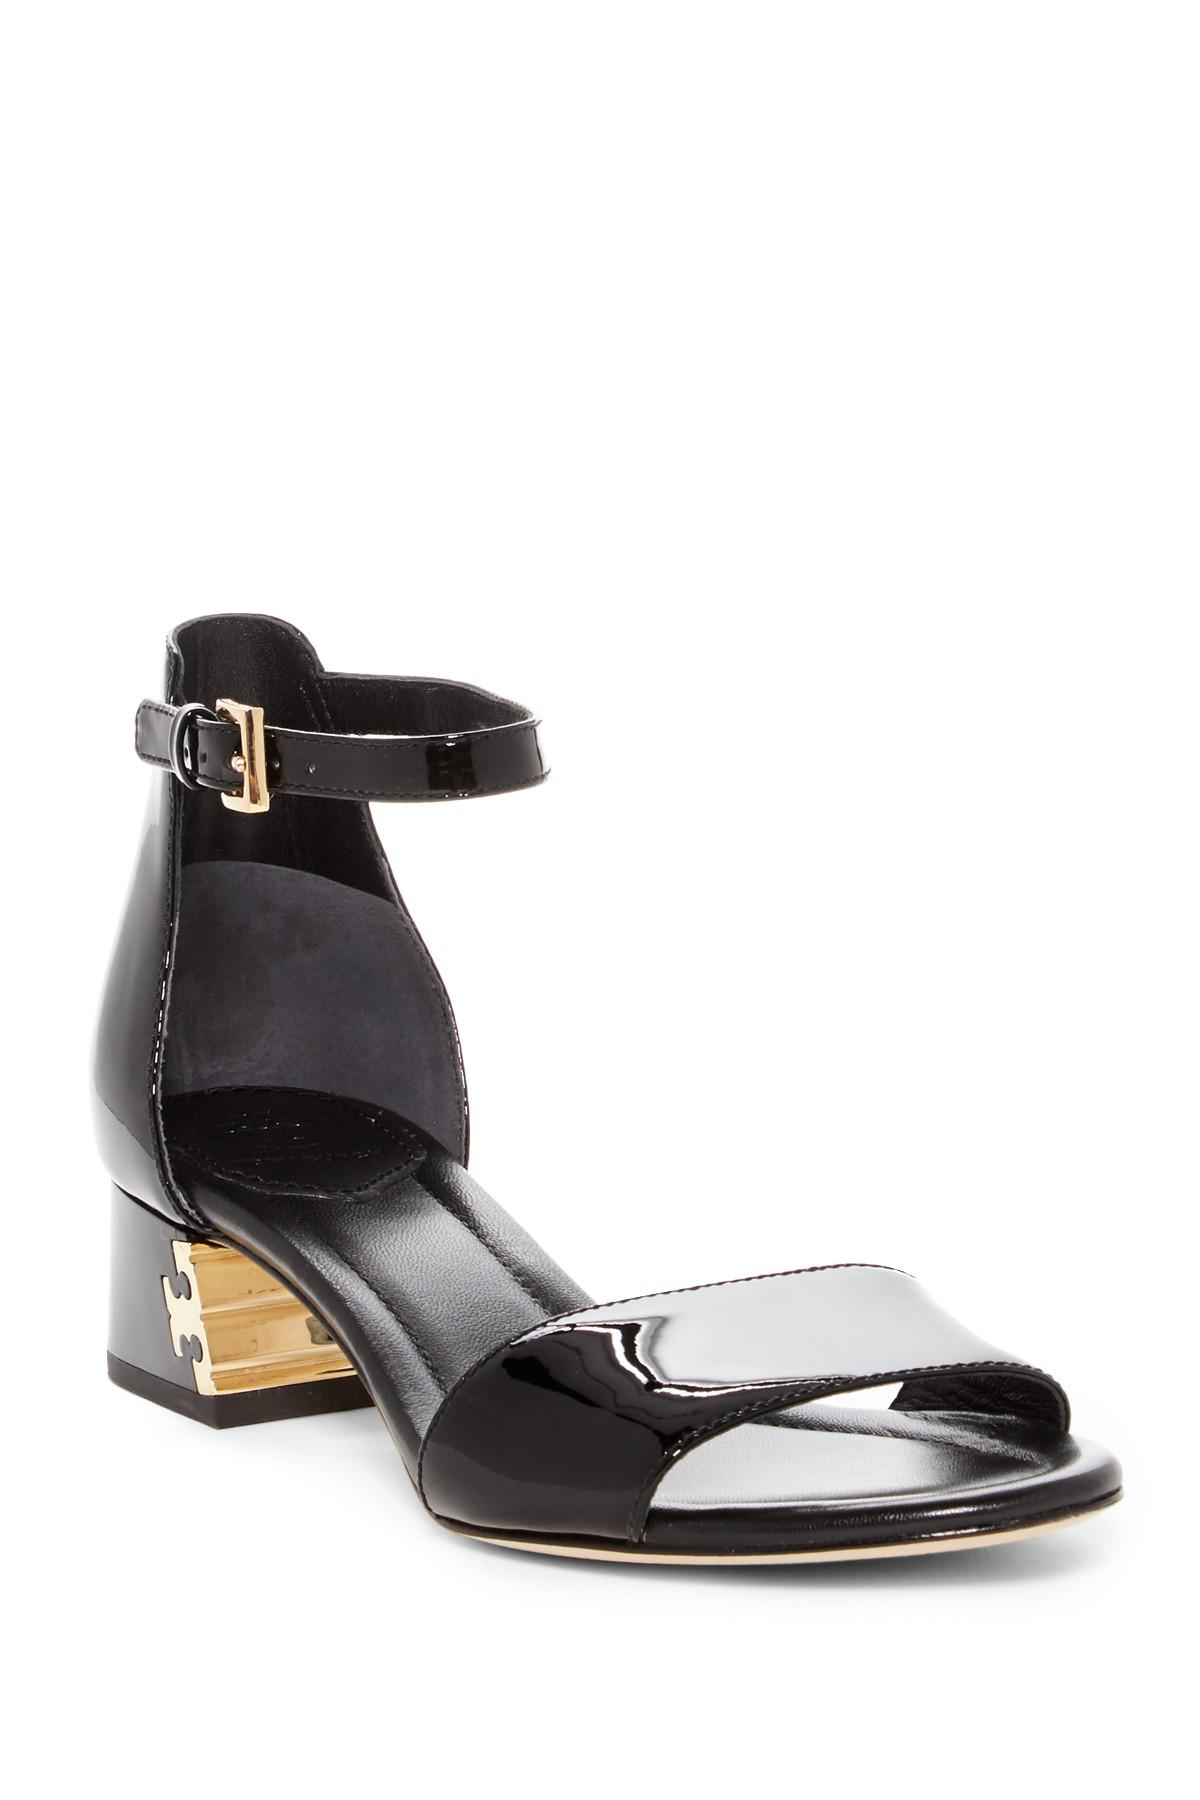 5d9de4438d57 Lyst - Tory Burch Finley Patent Leather Sandal in Black